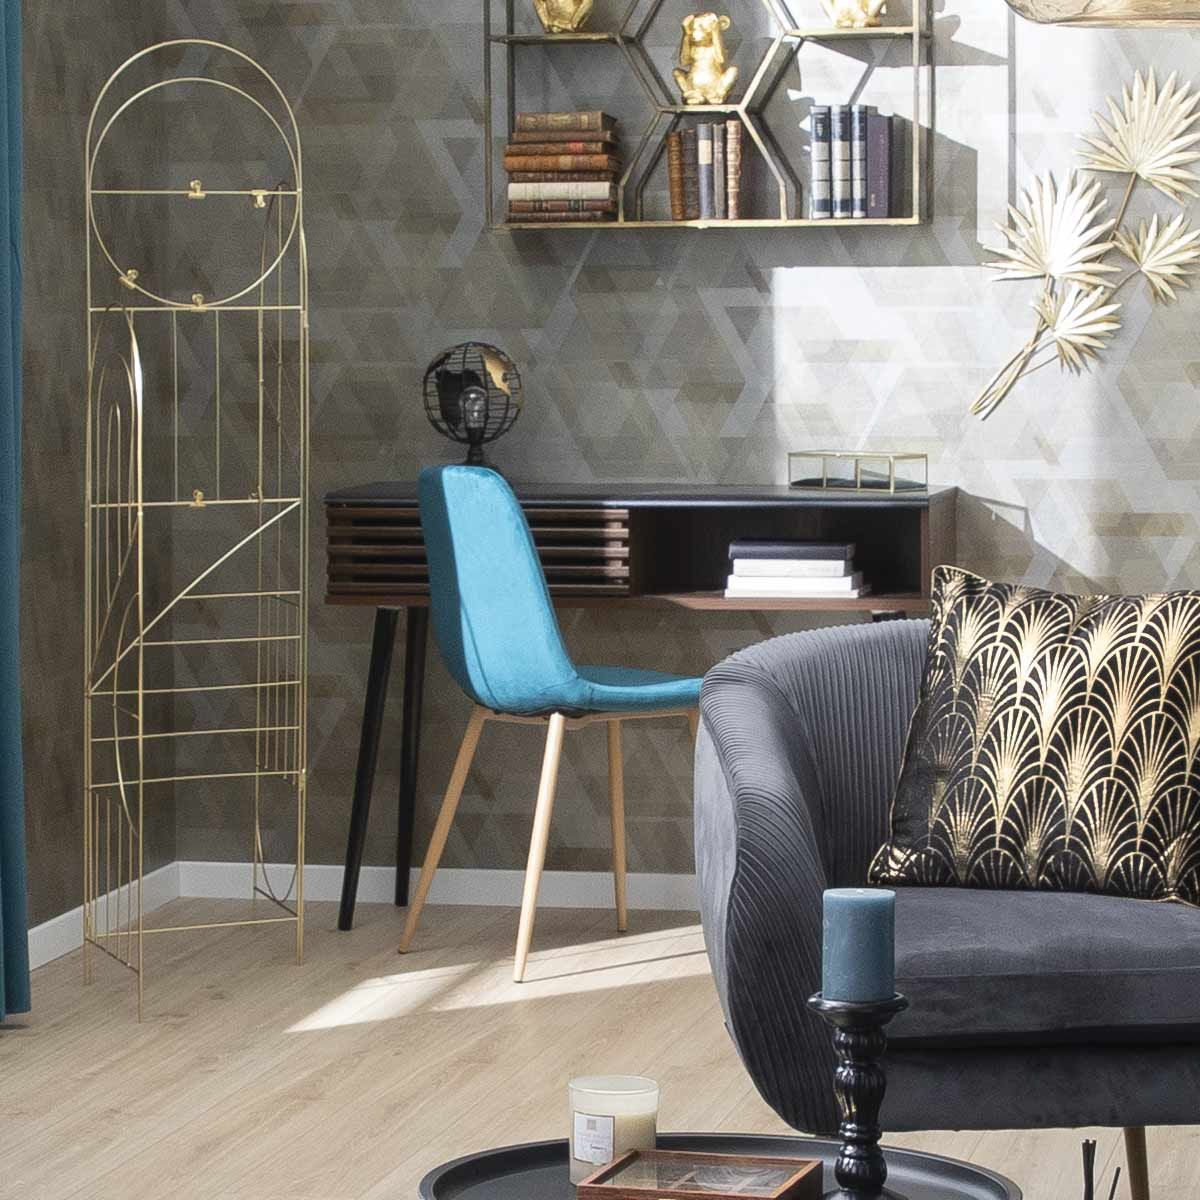 Chaise bleu canard scandinave en velours Roka